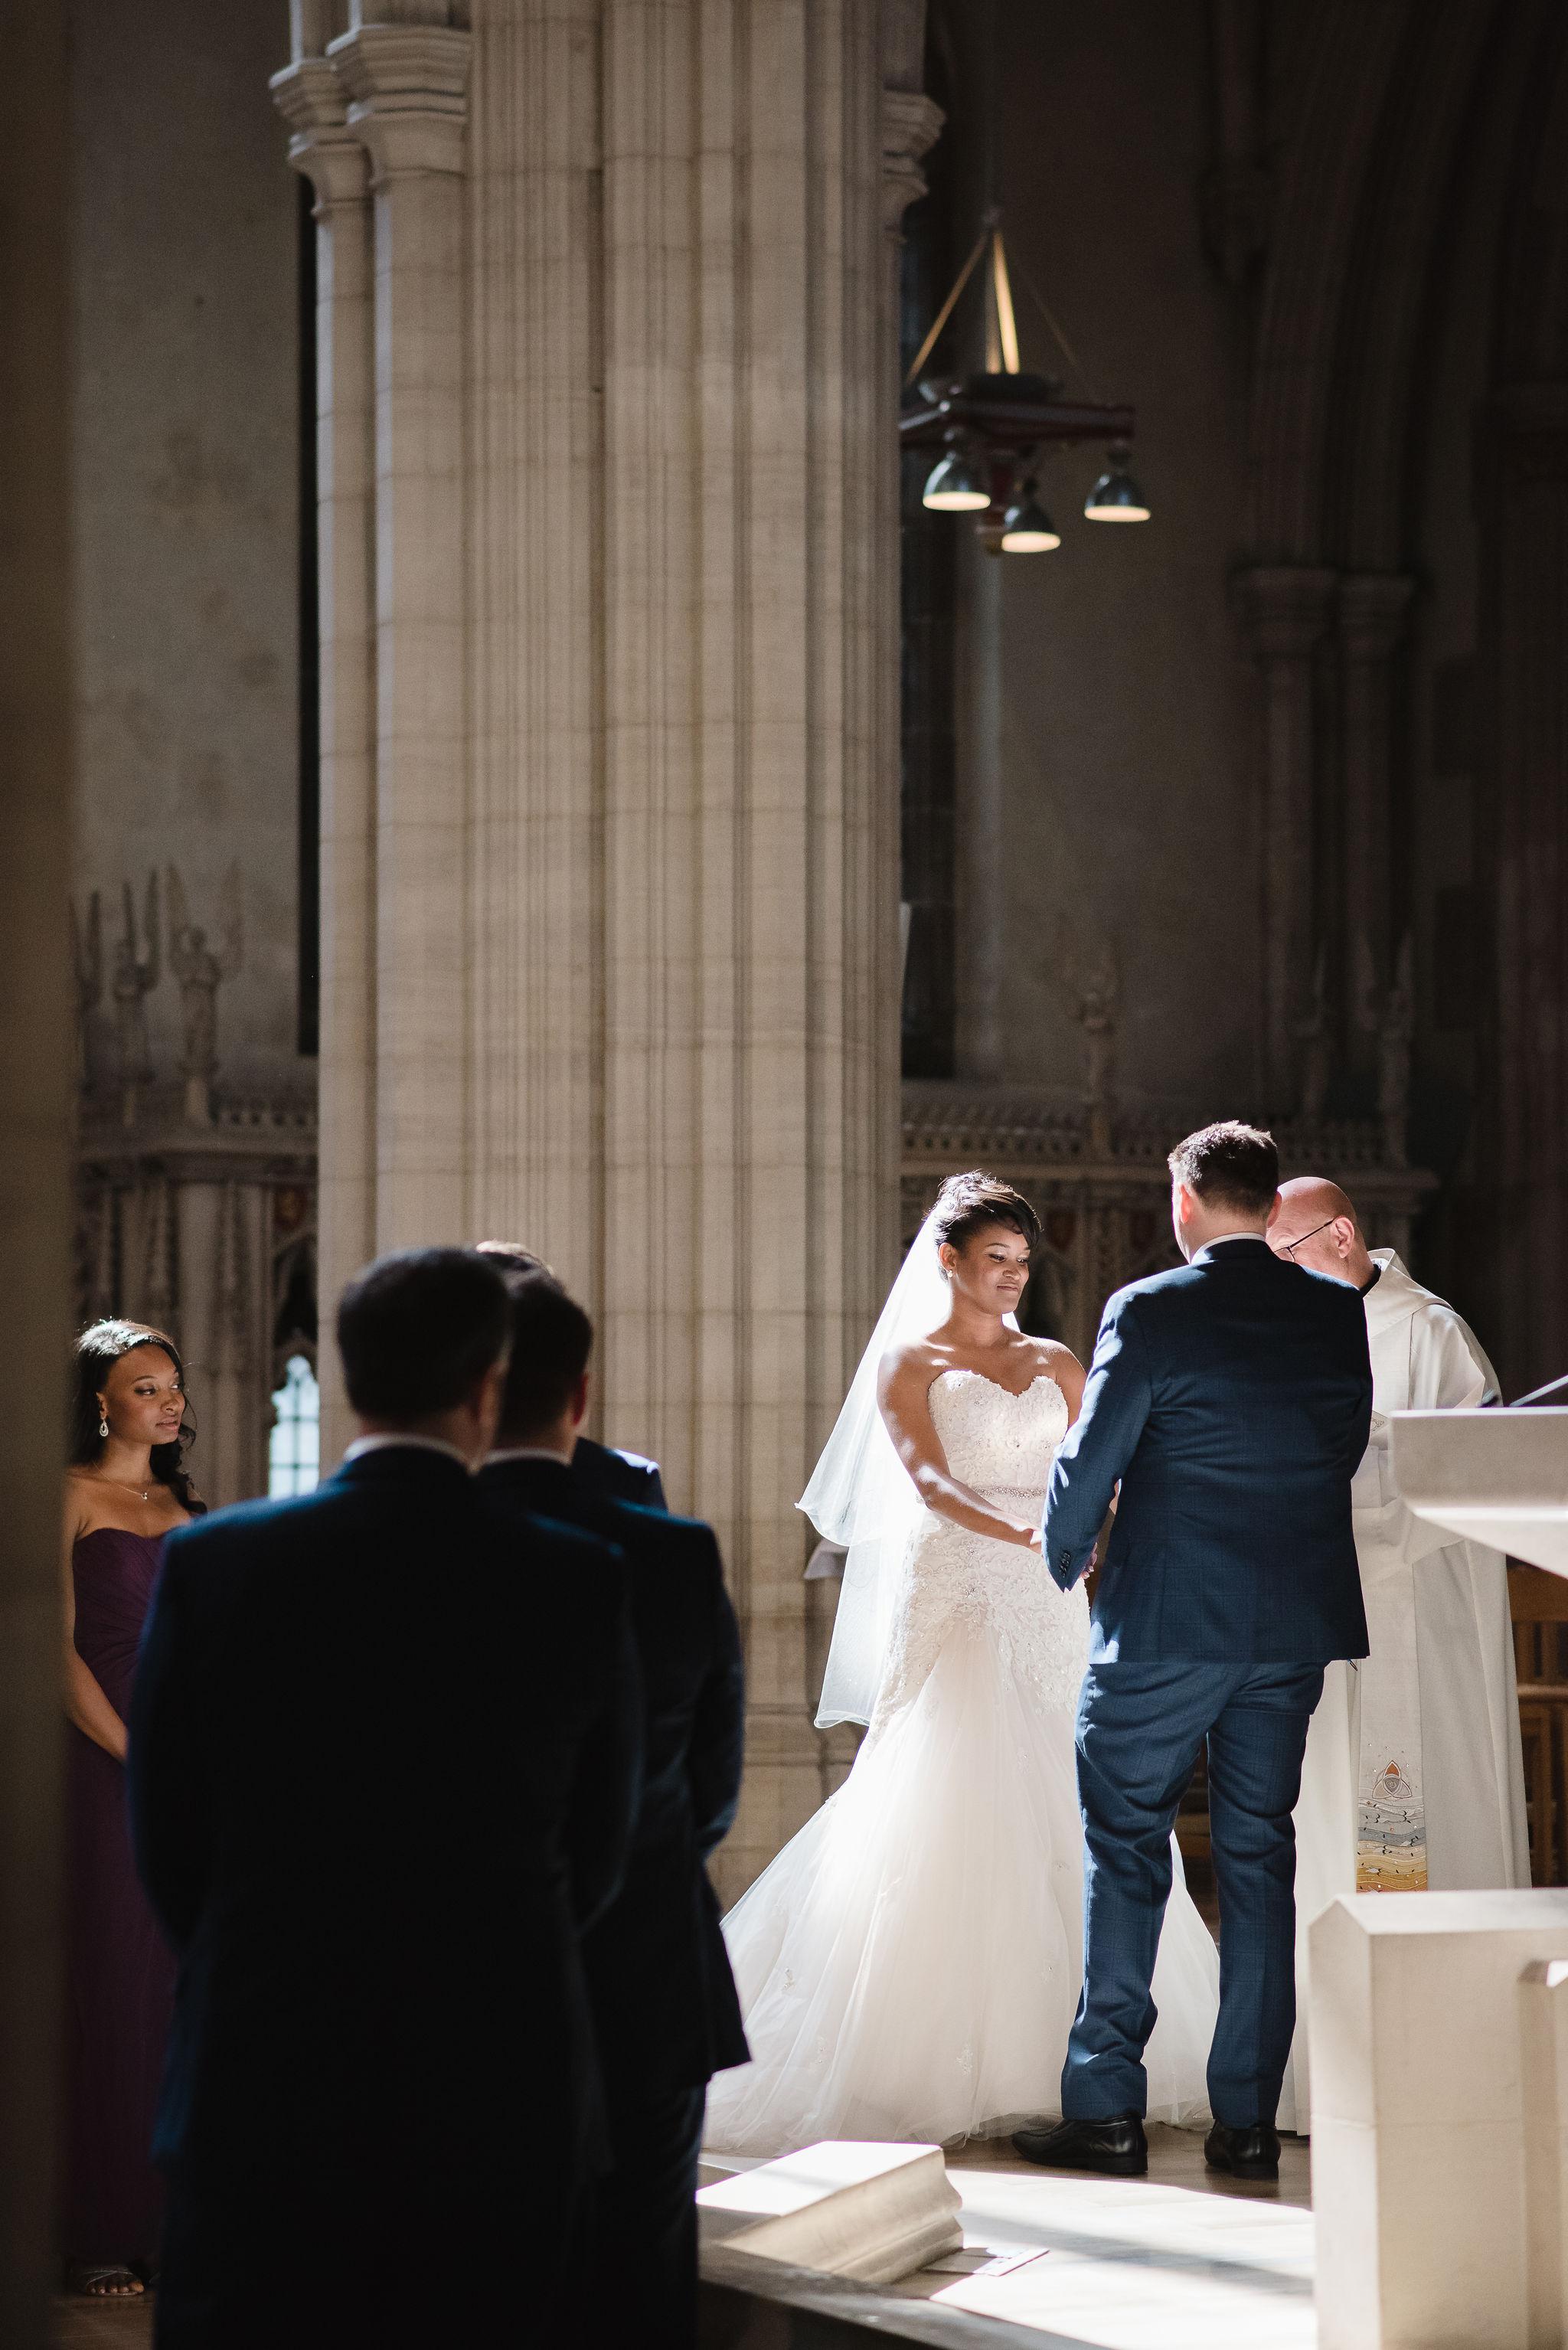 The Anthologist_Drake_and_Morgan_London_Wedding_52.jpg